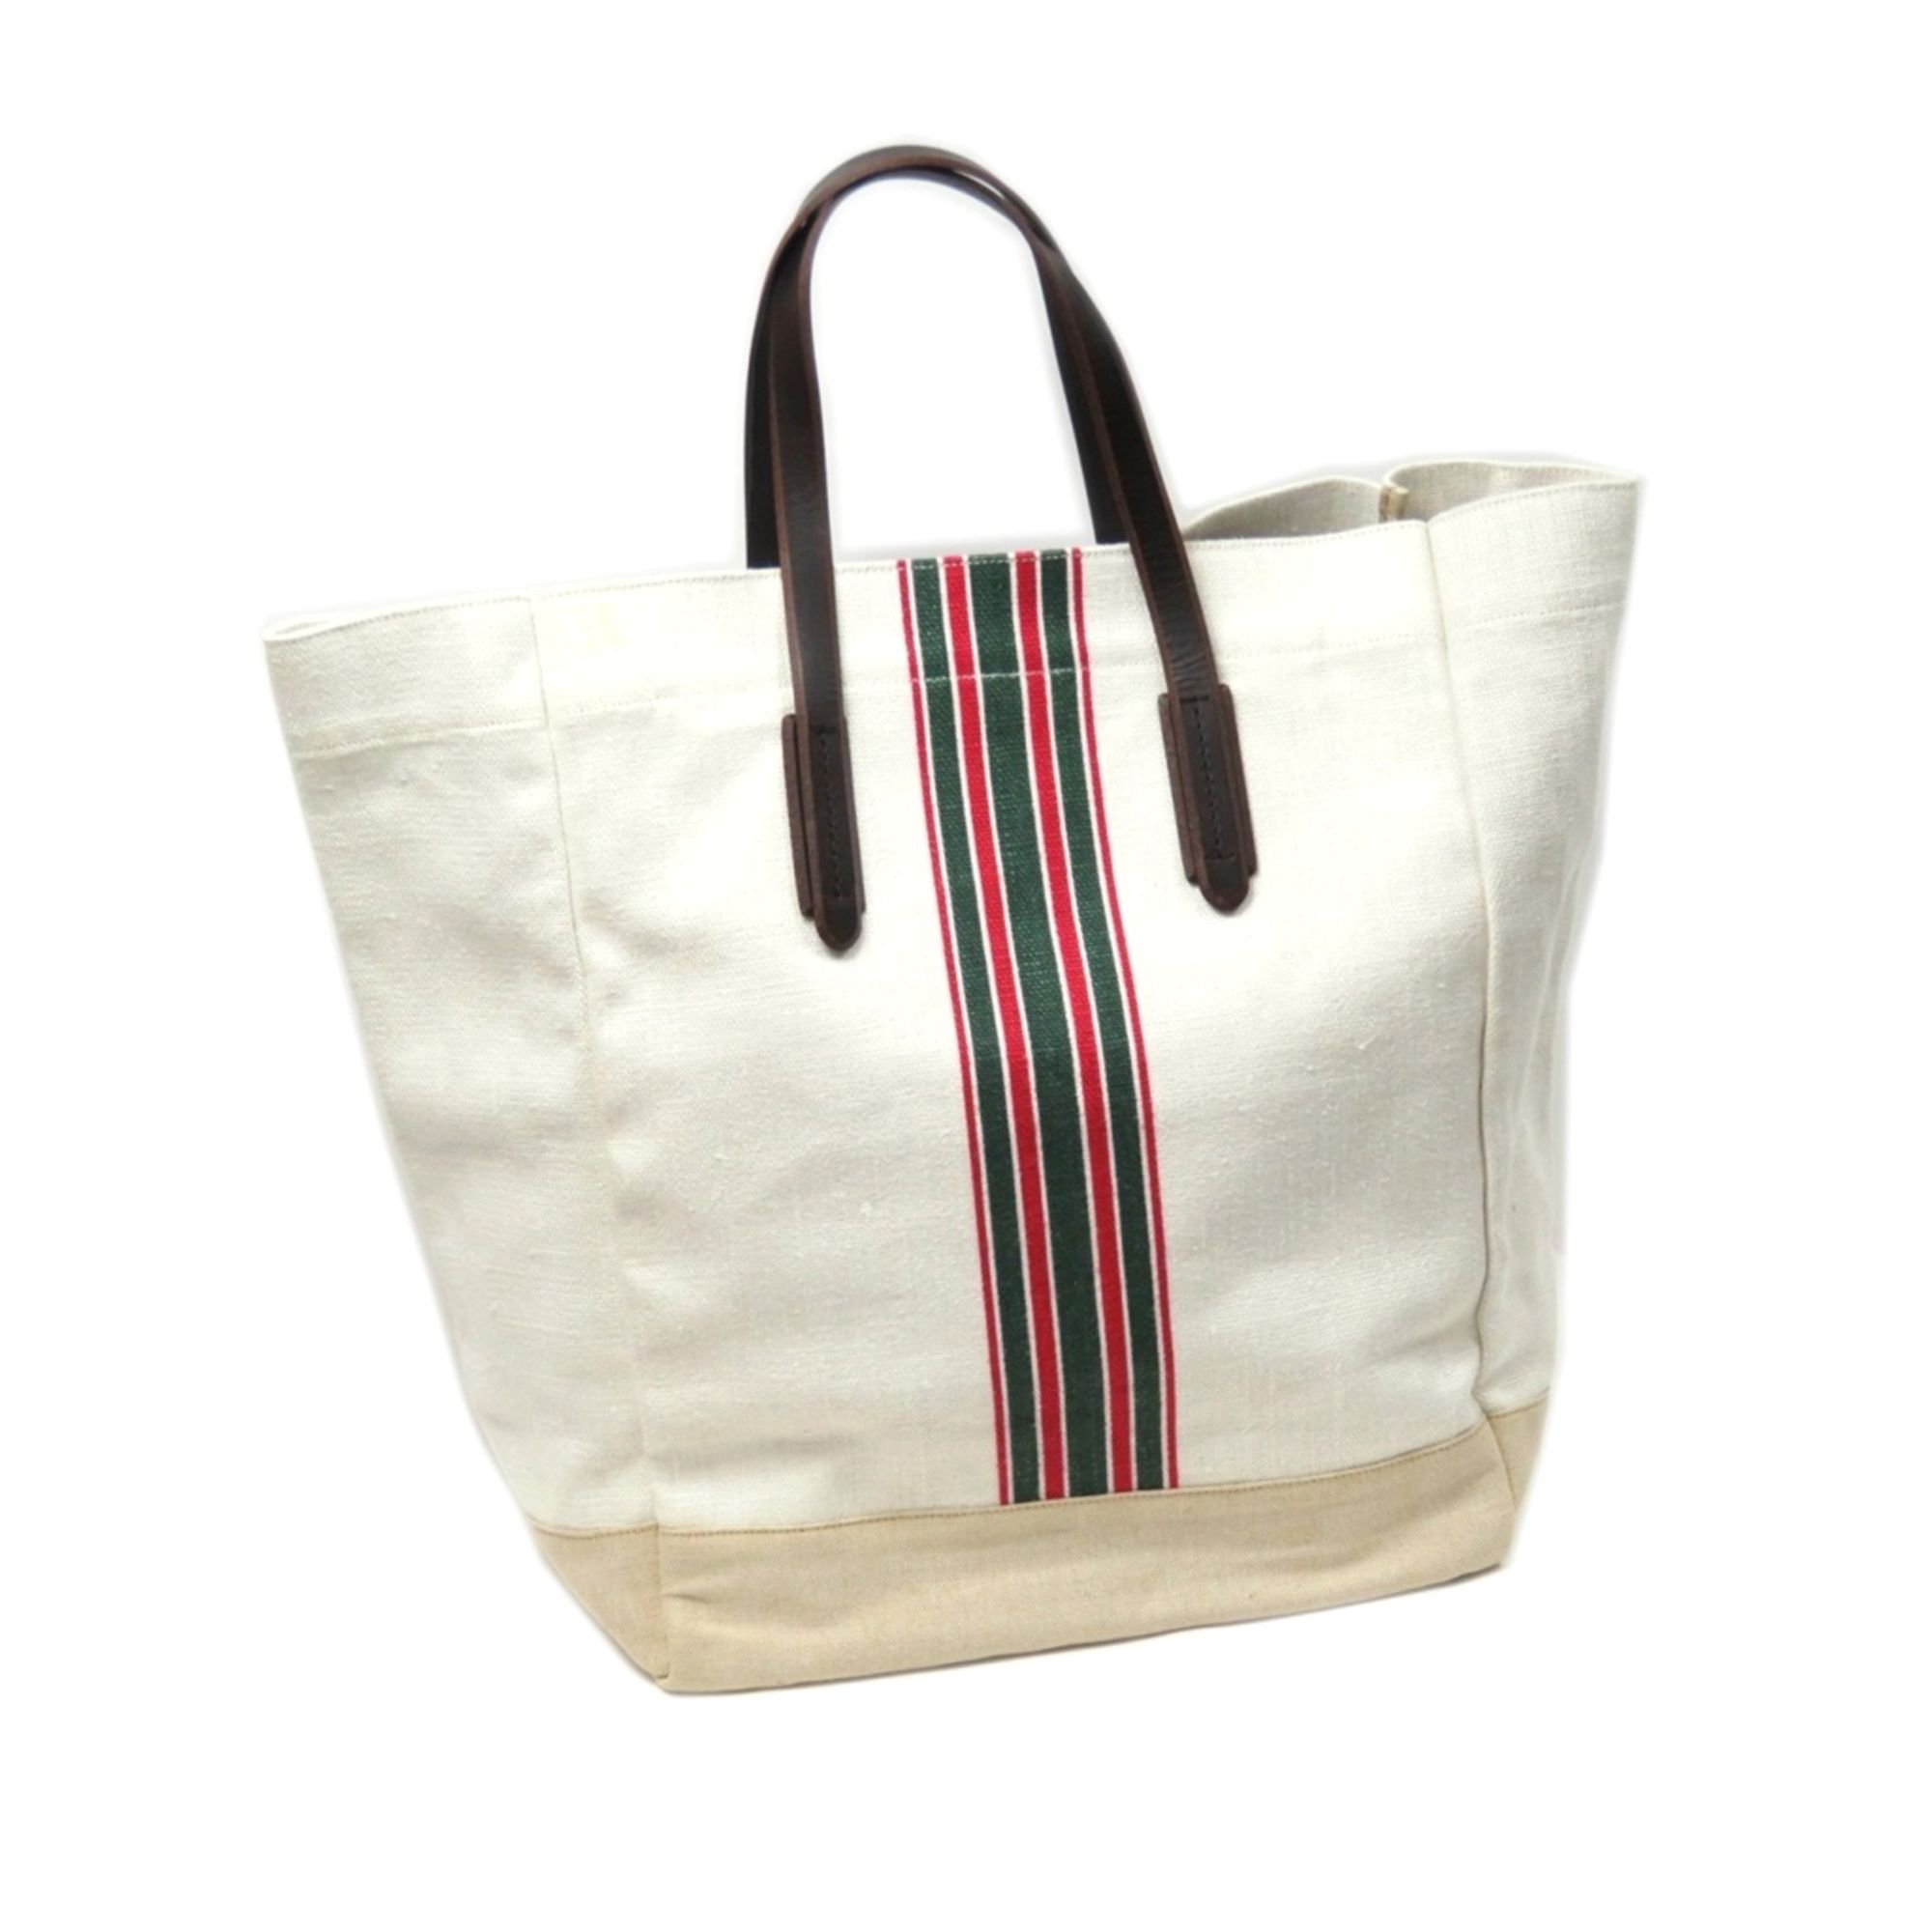 Vintage Gucci Web Canvas Tote Bag White